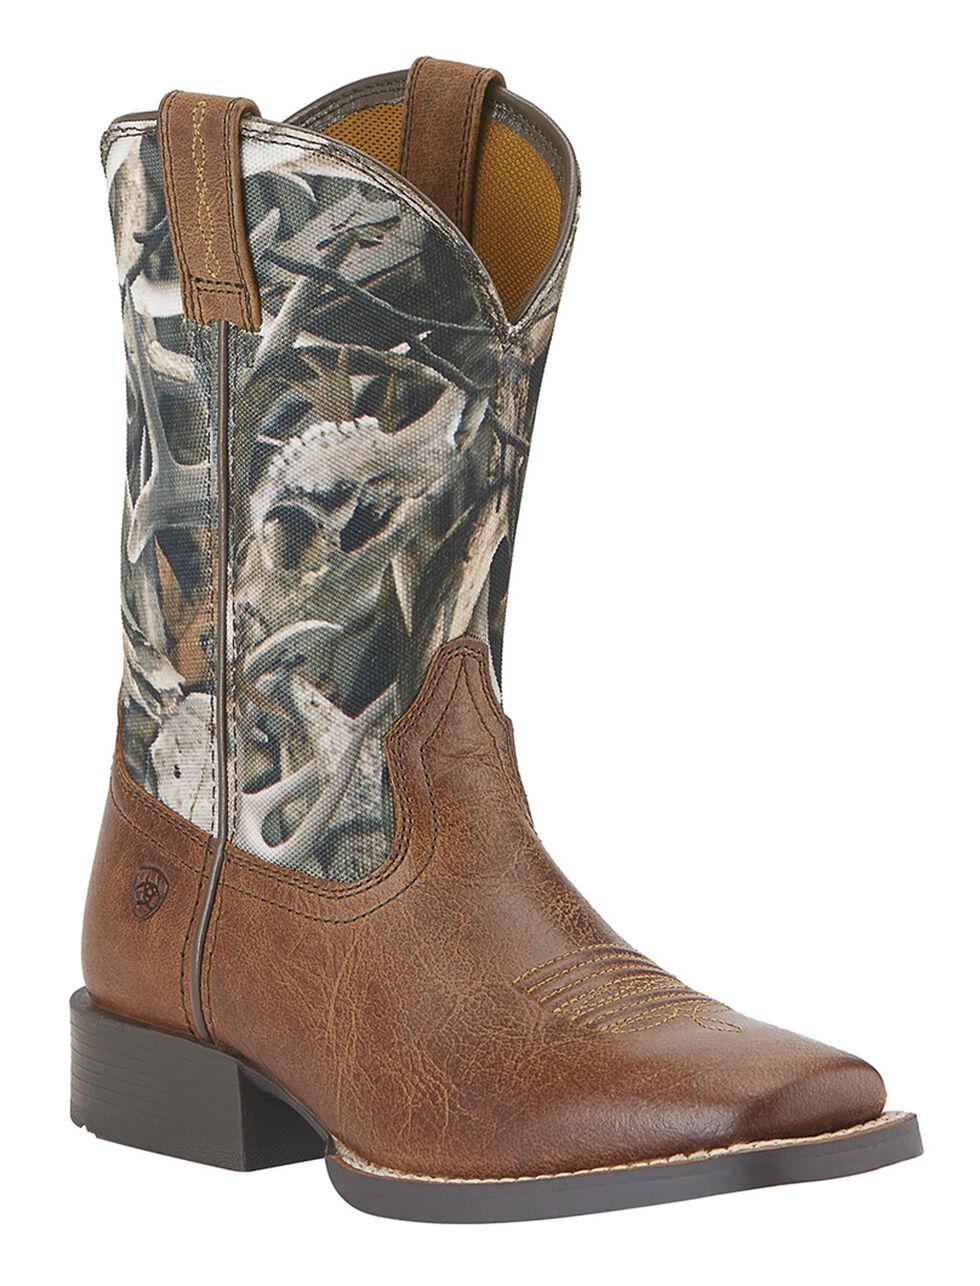 Ariat Boys' Quickdraw Camo Boots - Square Toe, , hi-res